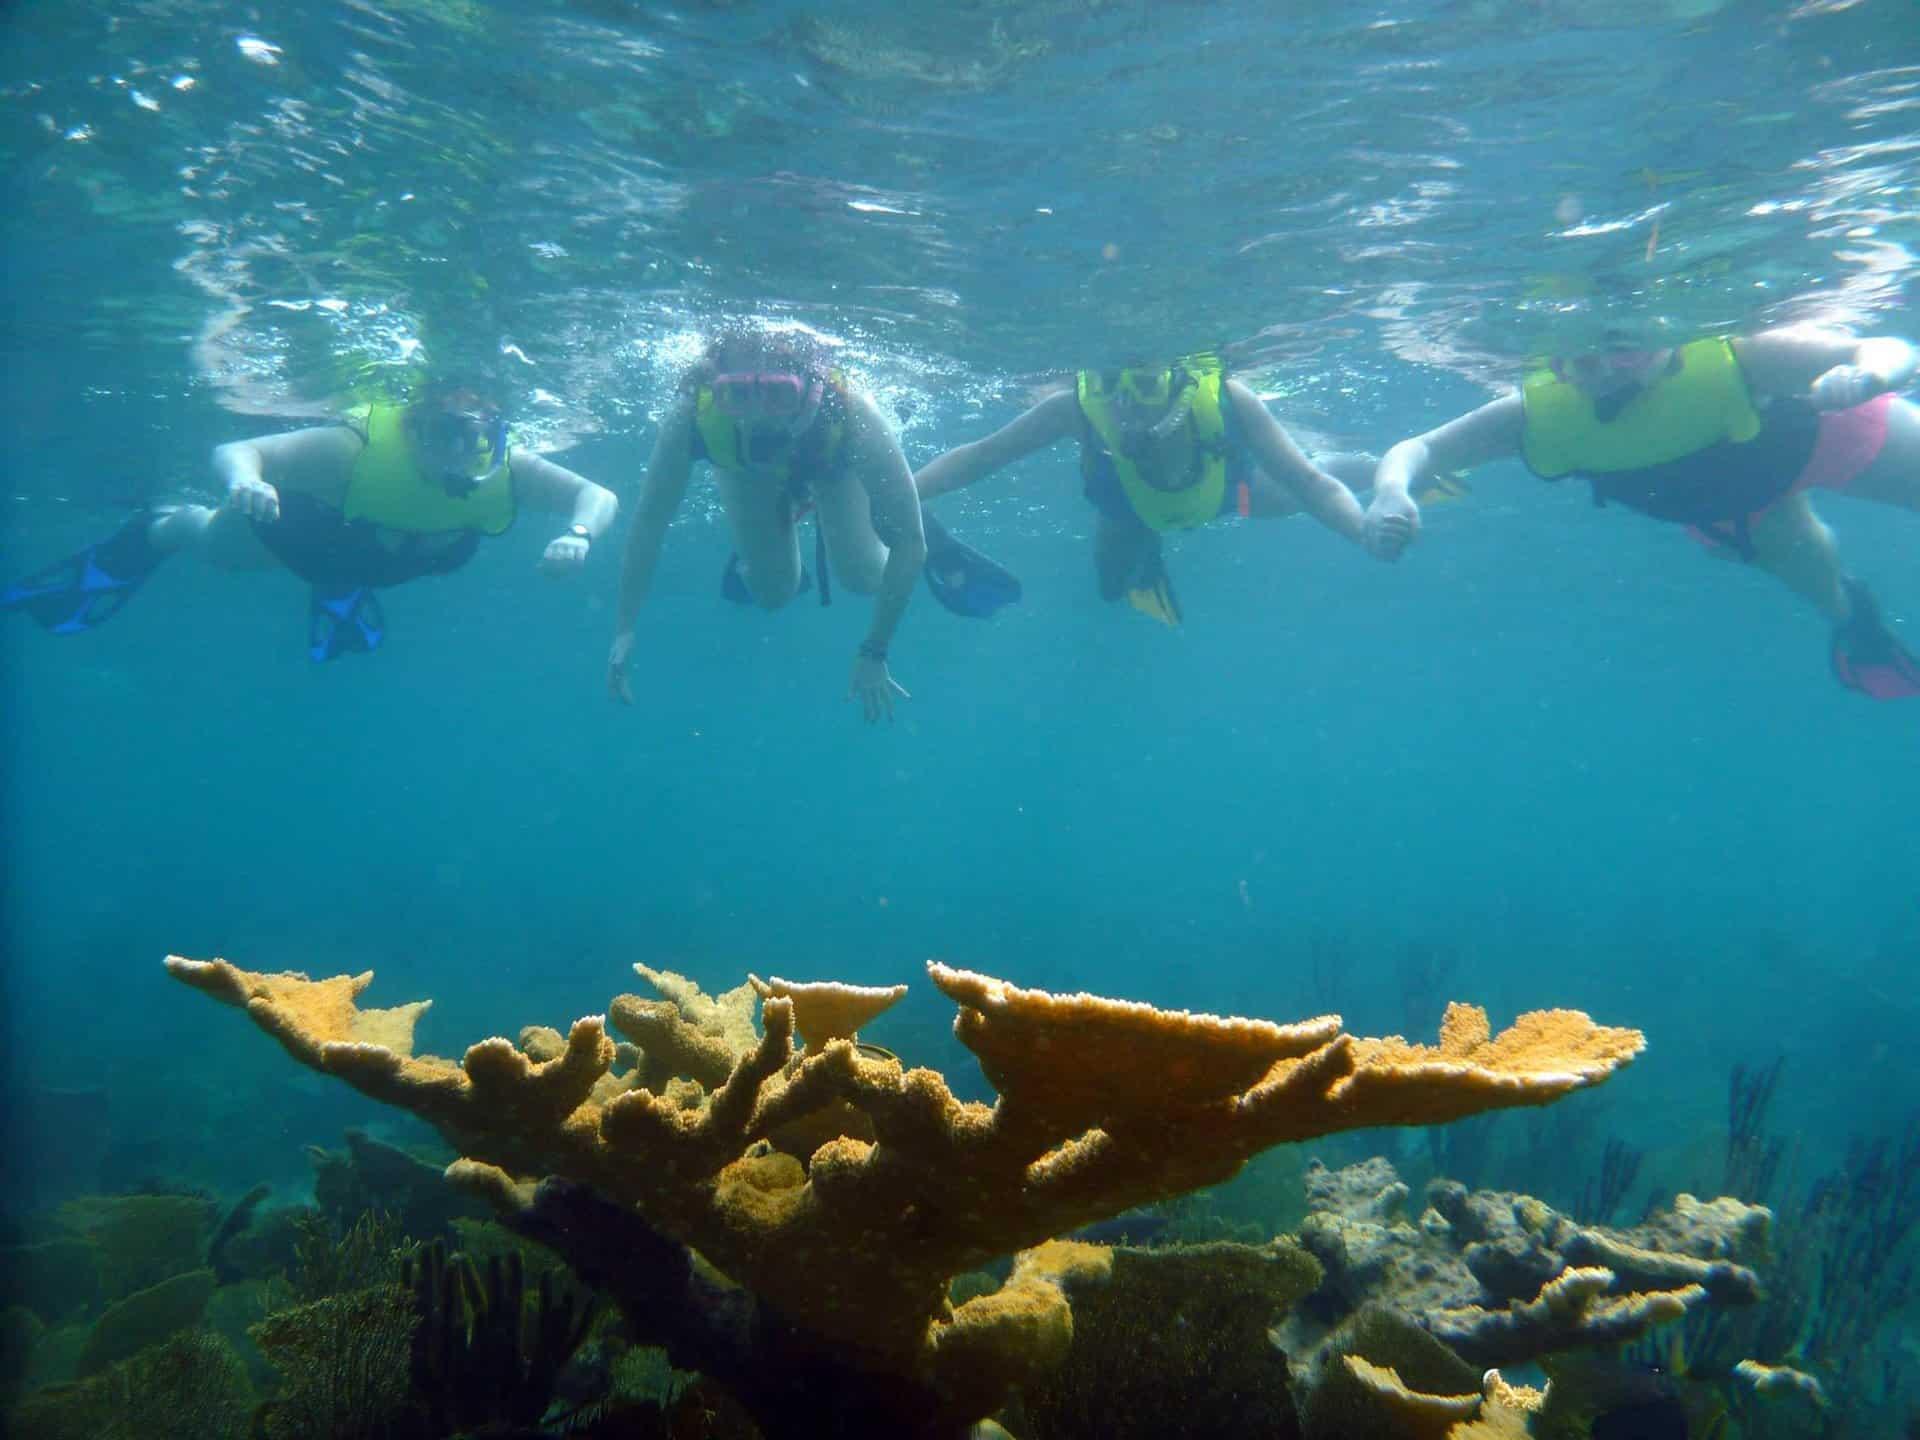 Freeport Kayak Reef Snorkeling Jamaica Cruise Excursions